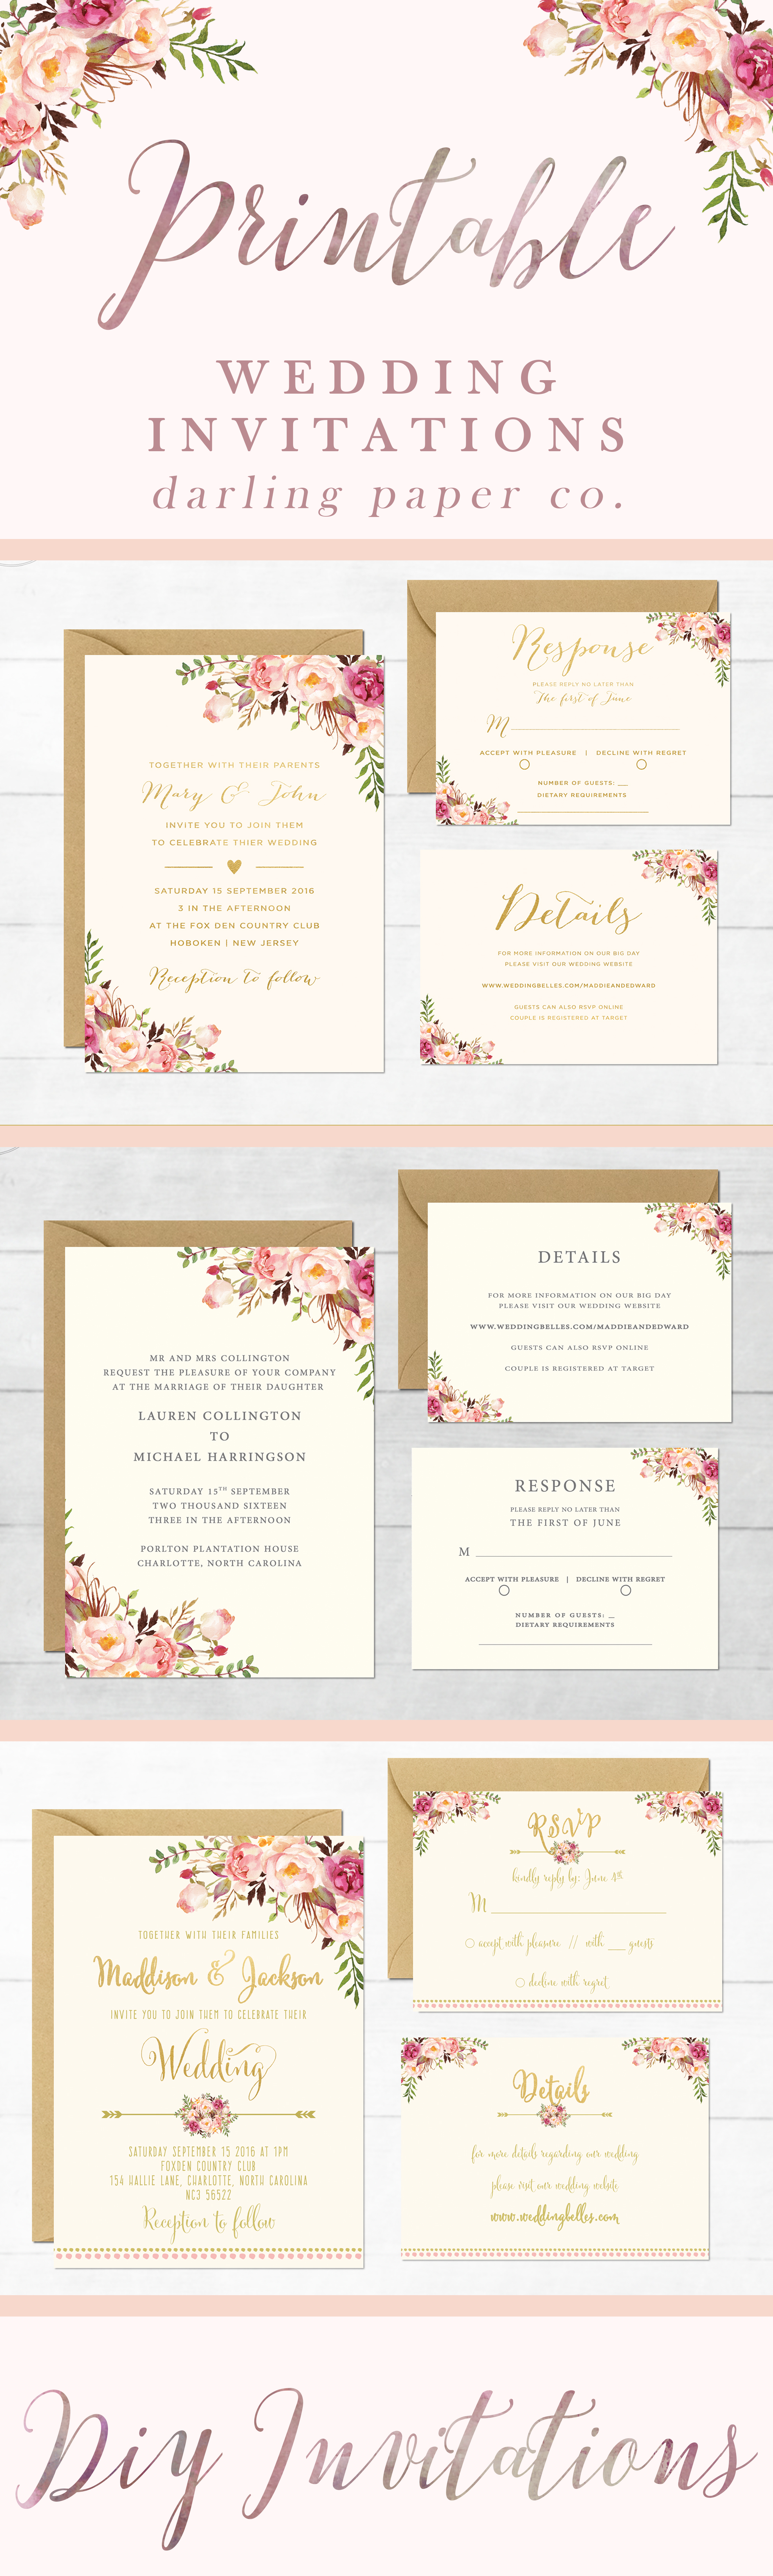 Wedding Invitations DIY - Printable Wedding Invitations - Floral Wedding Suite - Boho Wedding - Chic Wedding Invitations - Rustic Wedding Invitations - Printable - DIY - Wedding Invitation Template by DarlingPaperCo. on Etsy